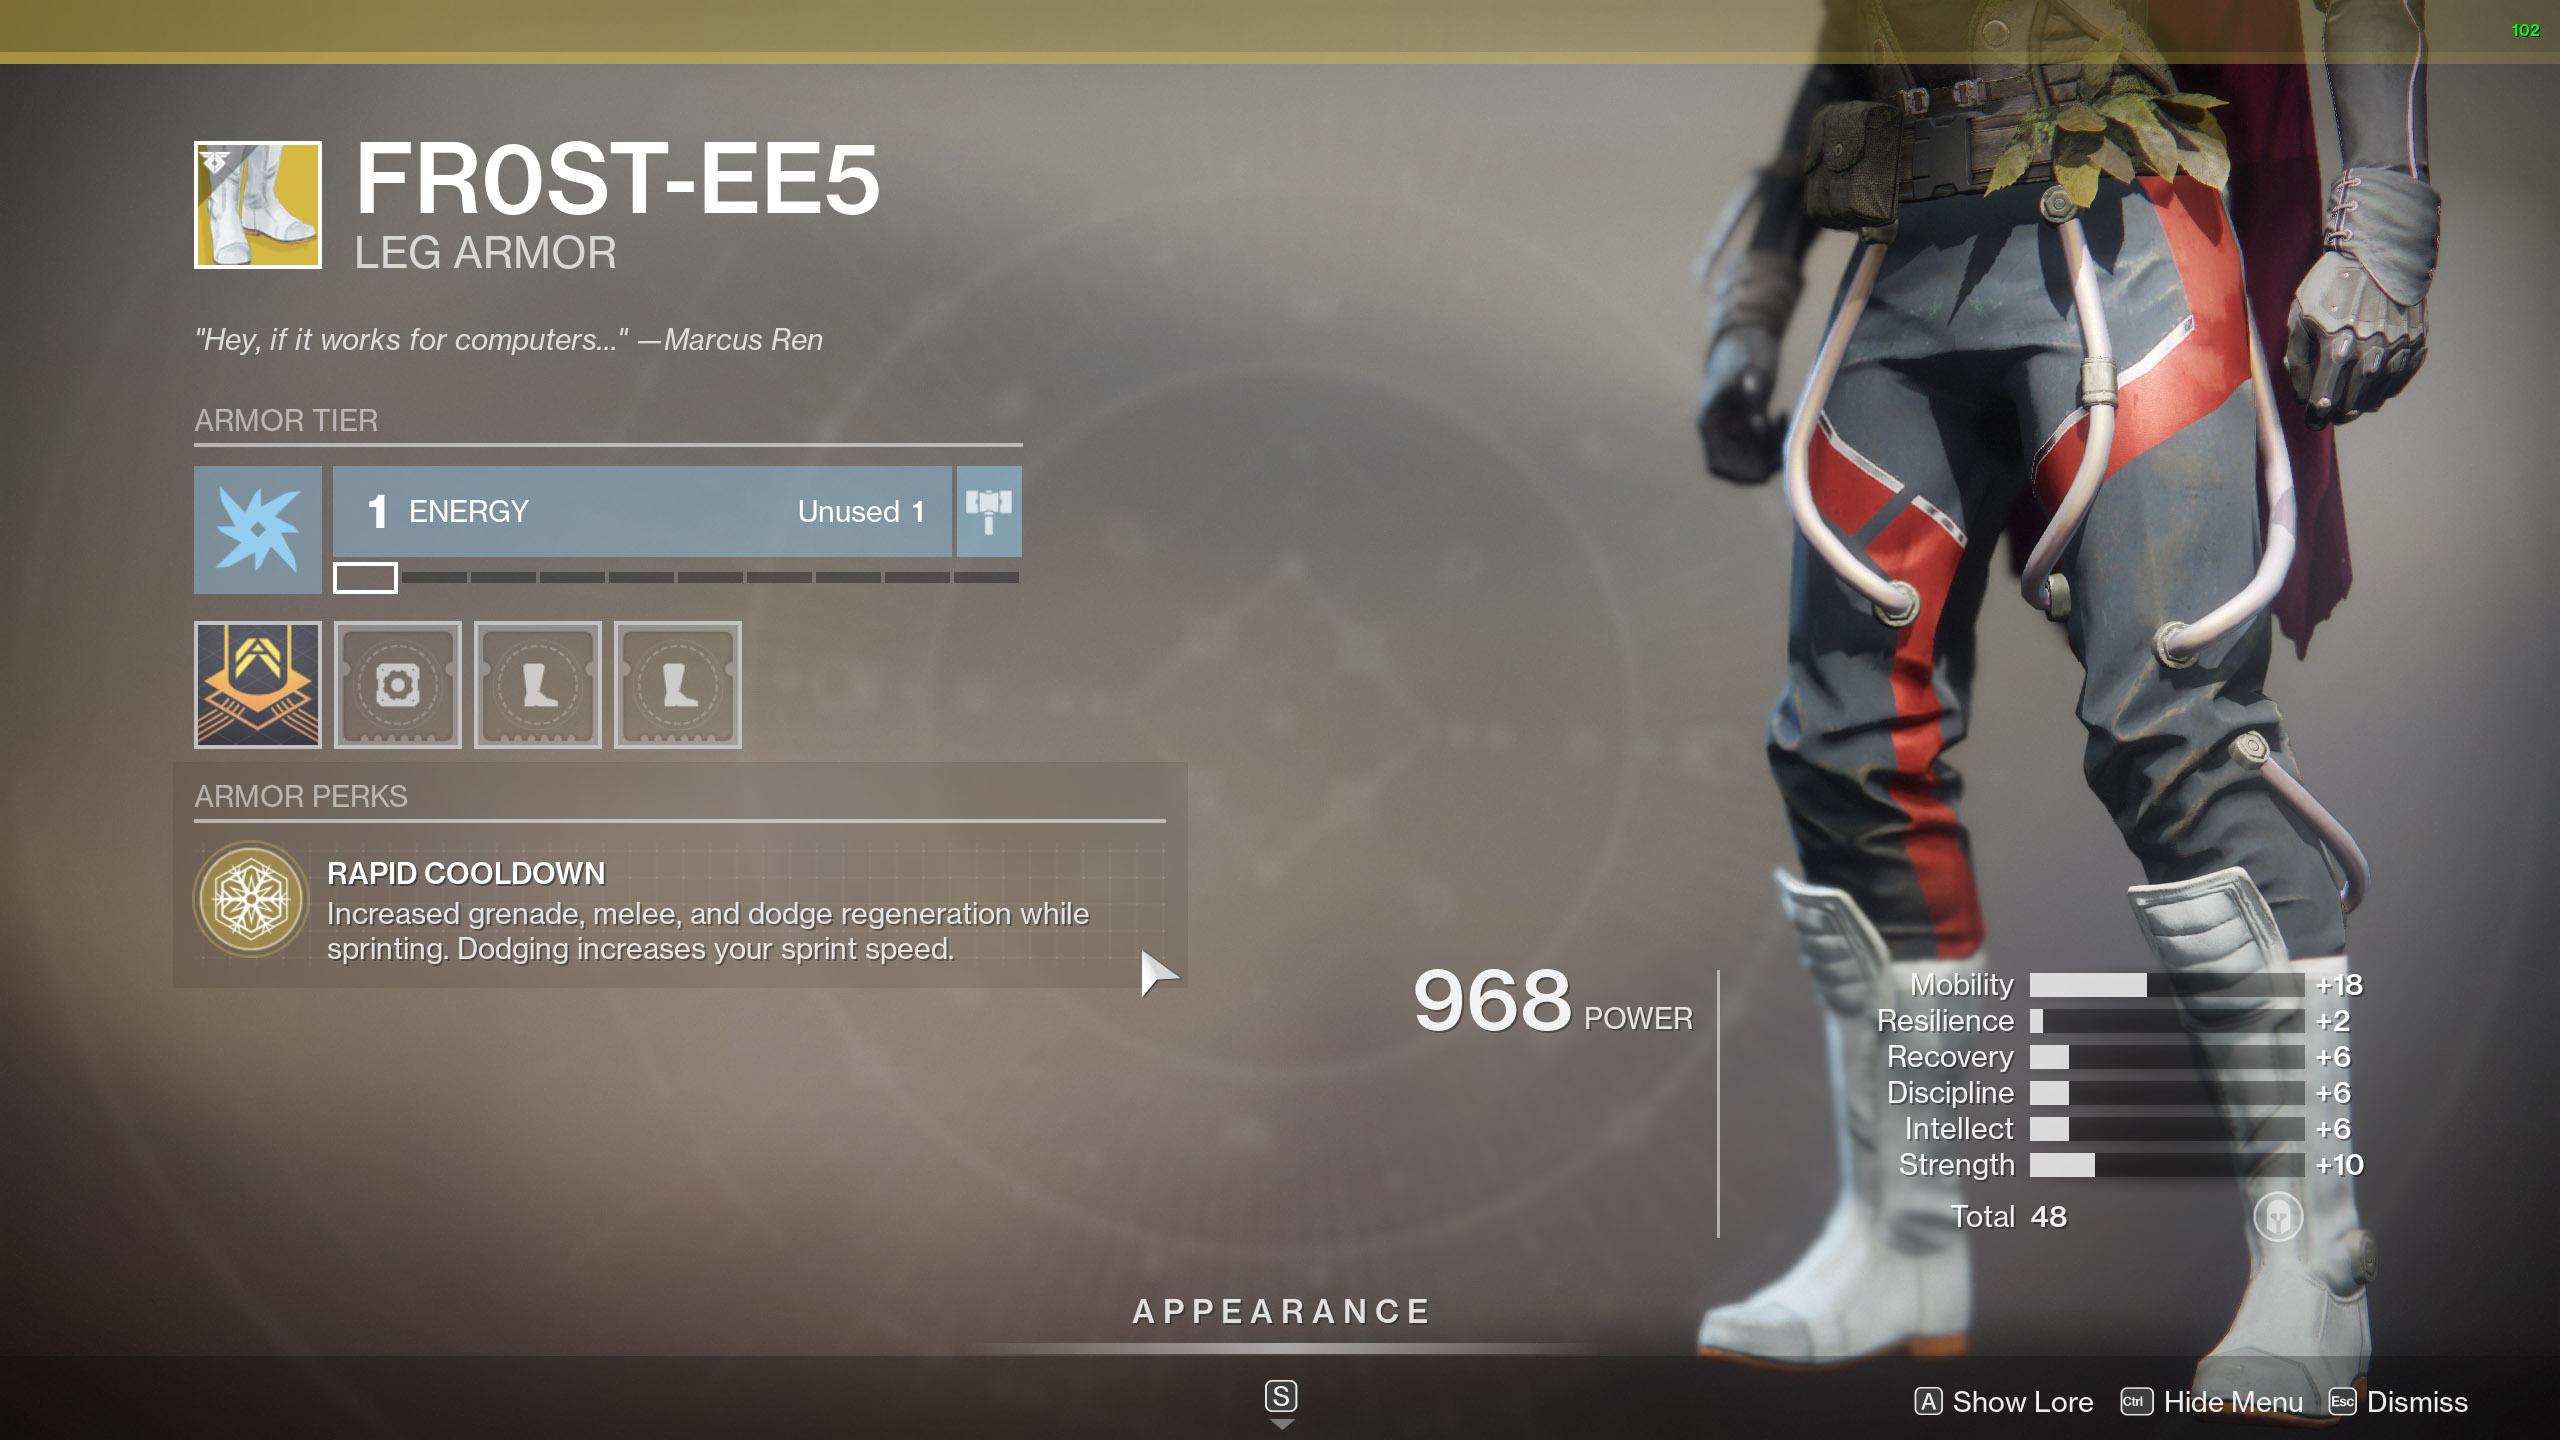 Destiny 2 Exotic Hunter armor Fr0st-EE5